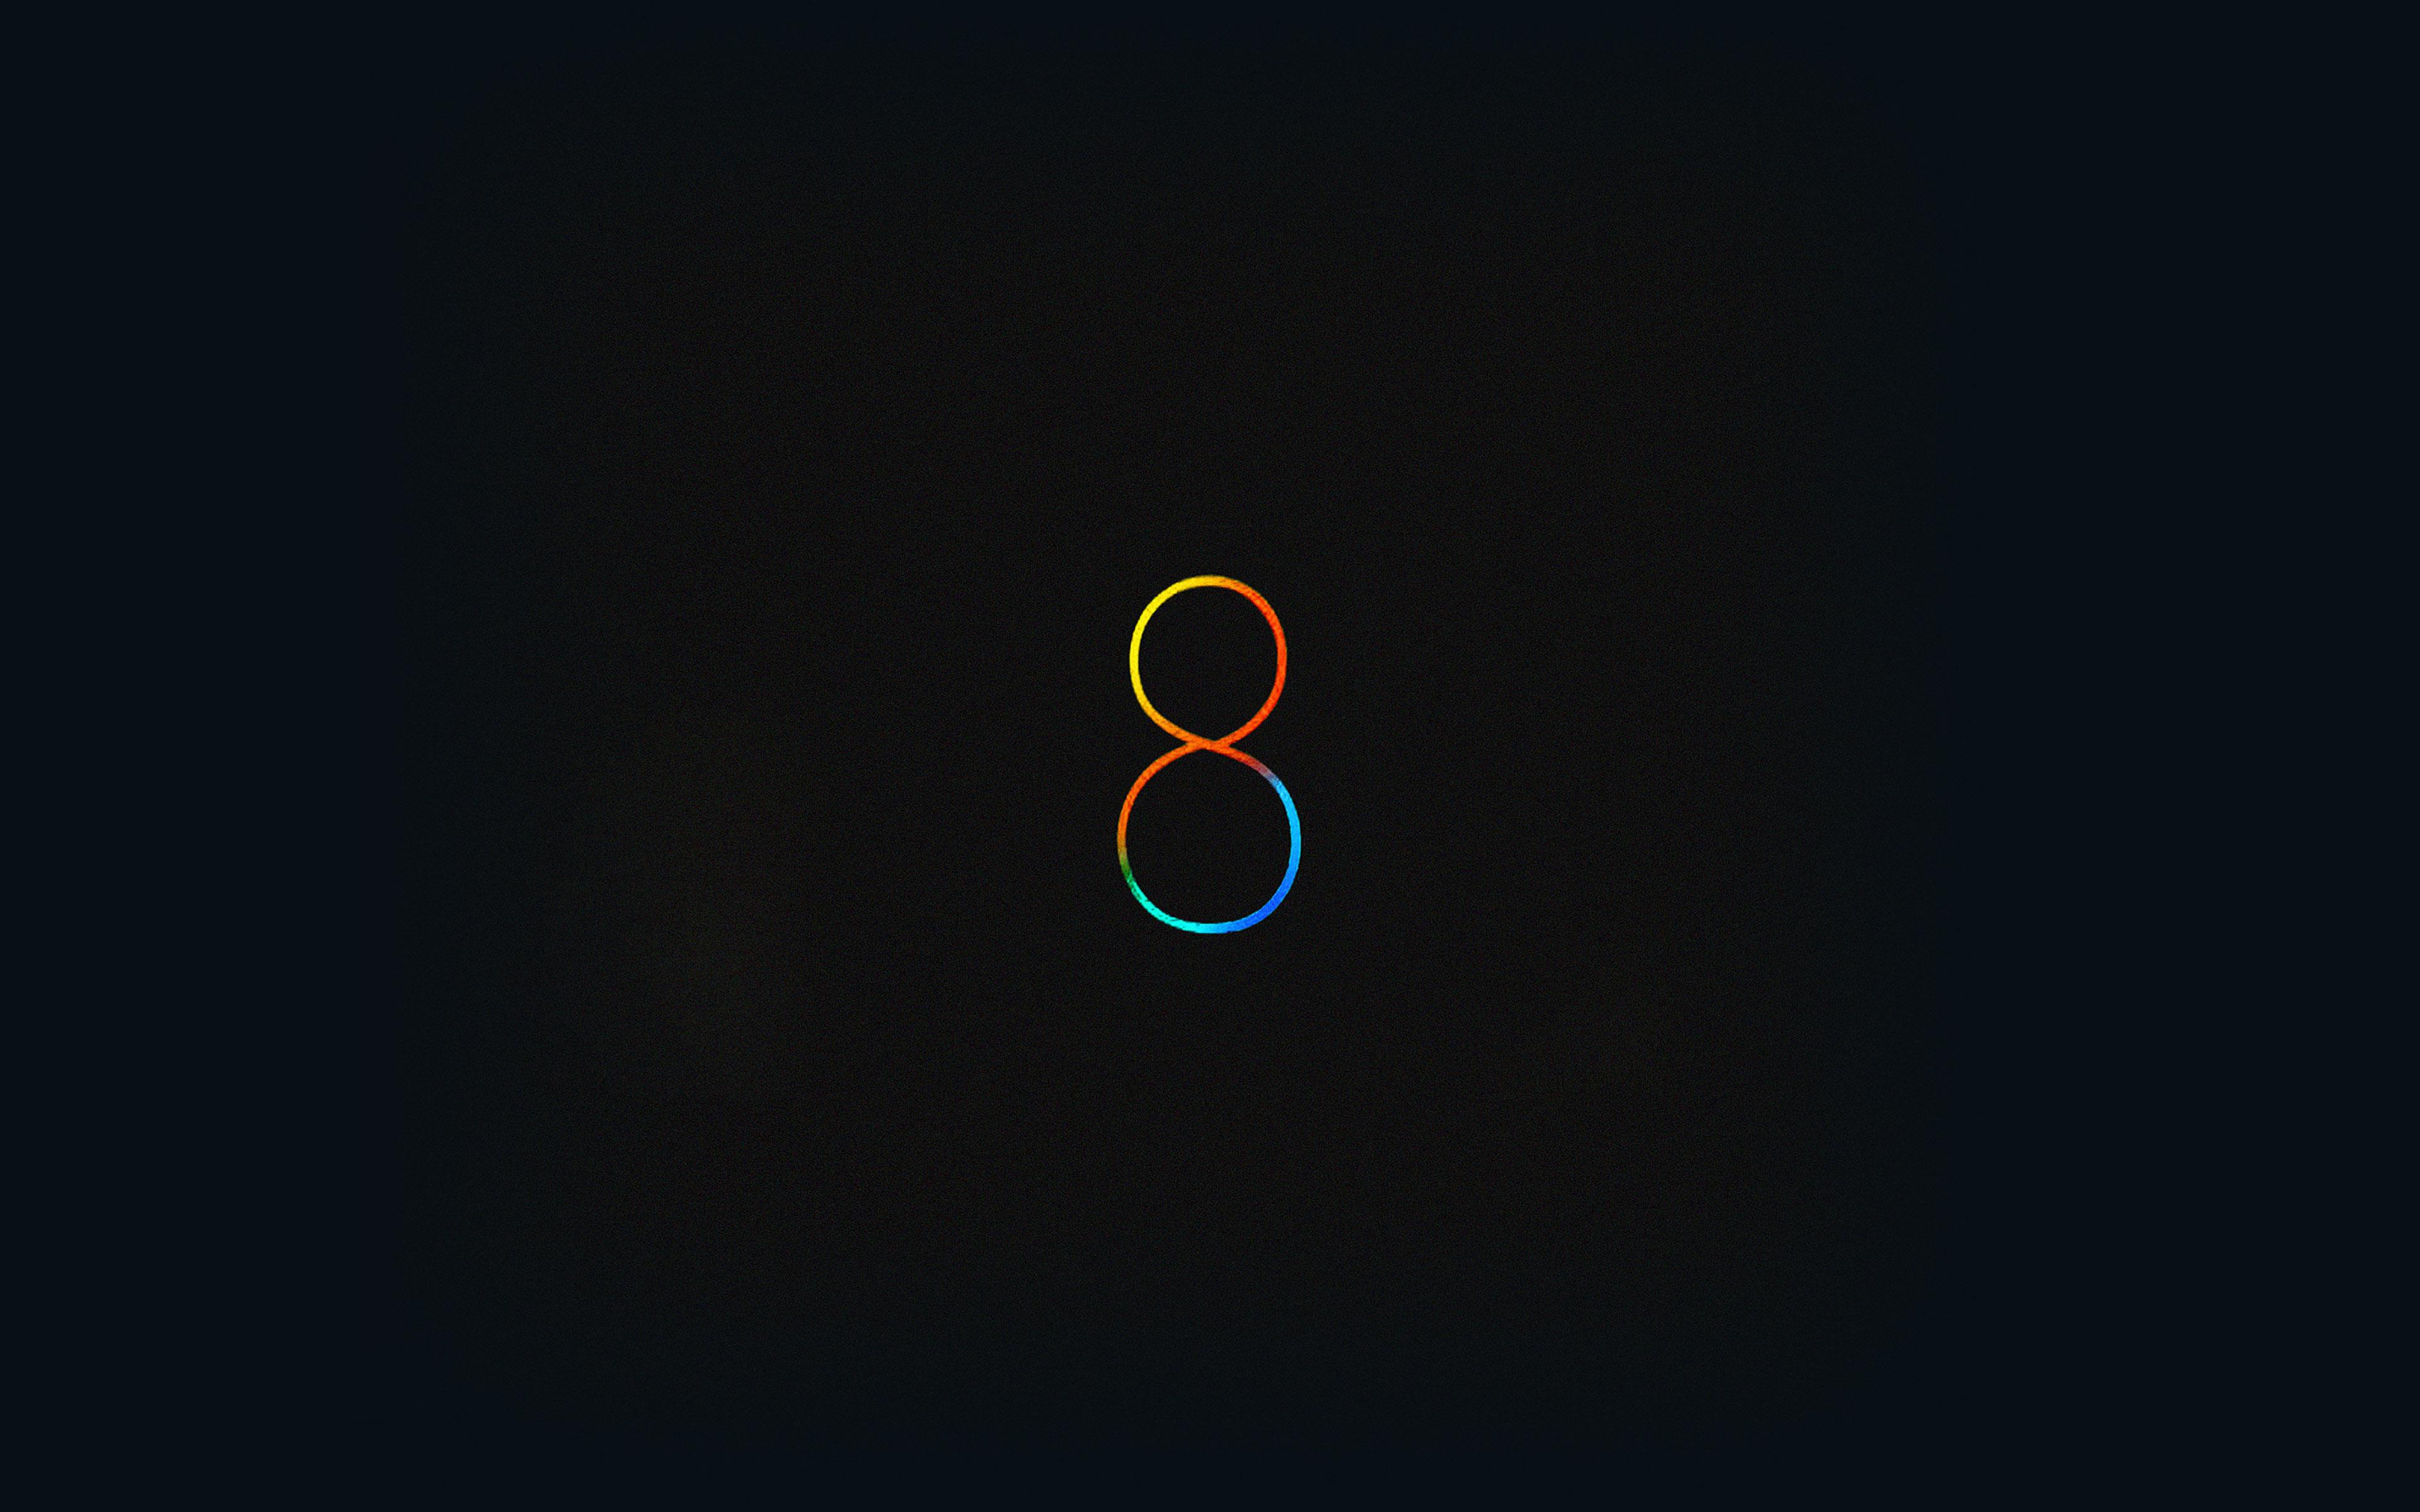 Aa88 Wallpaper Free Ios 8 Black Apple Papersco